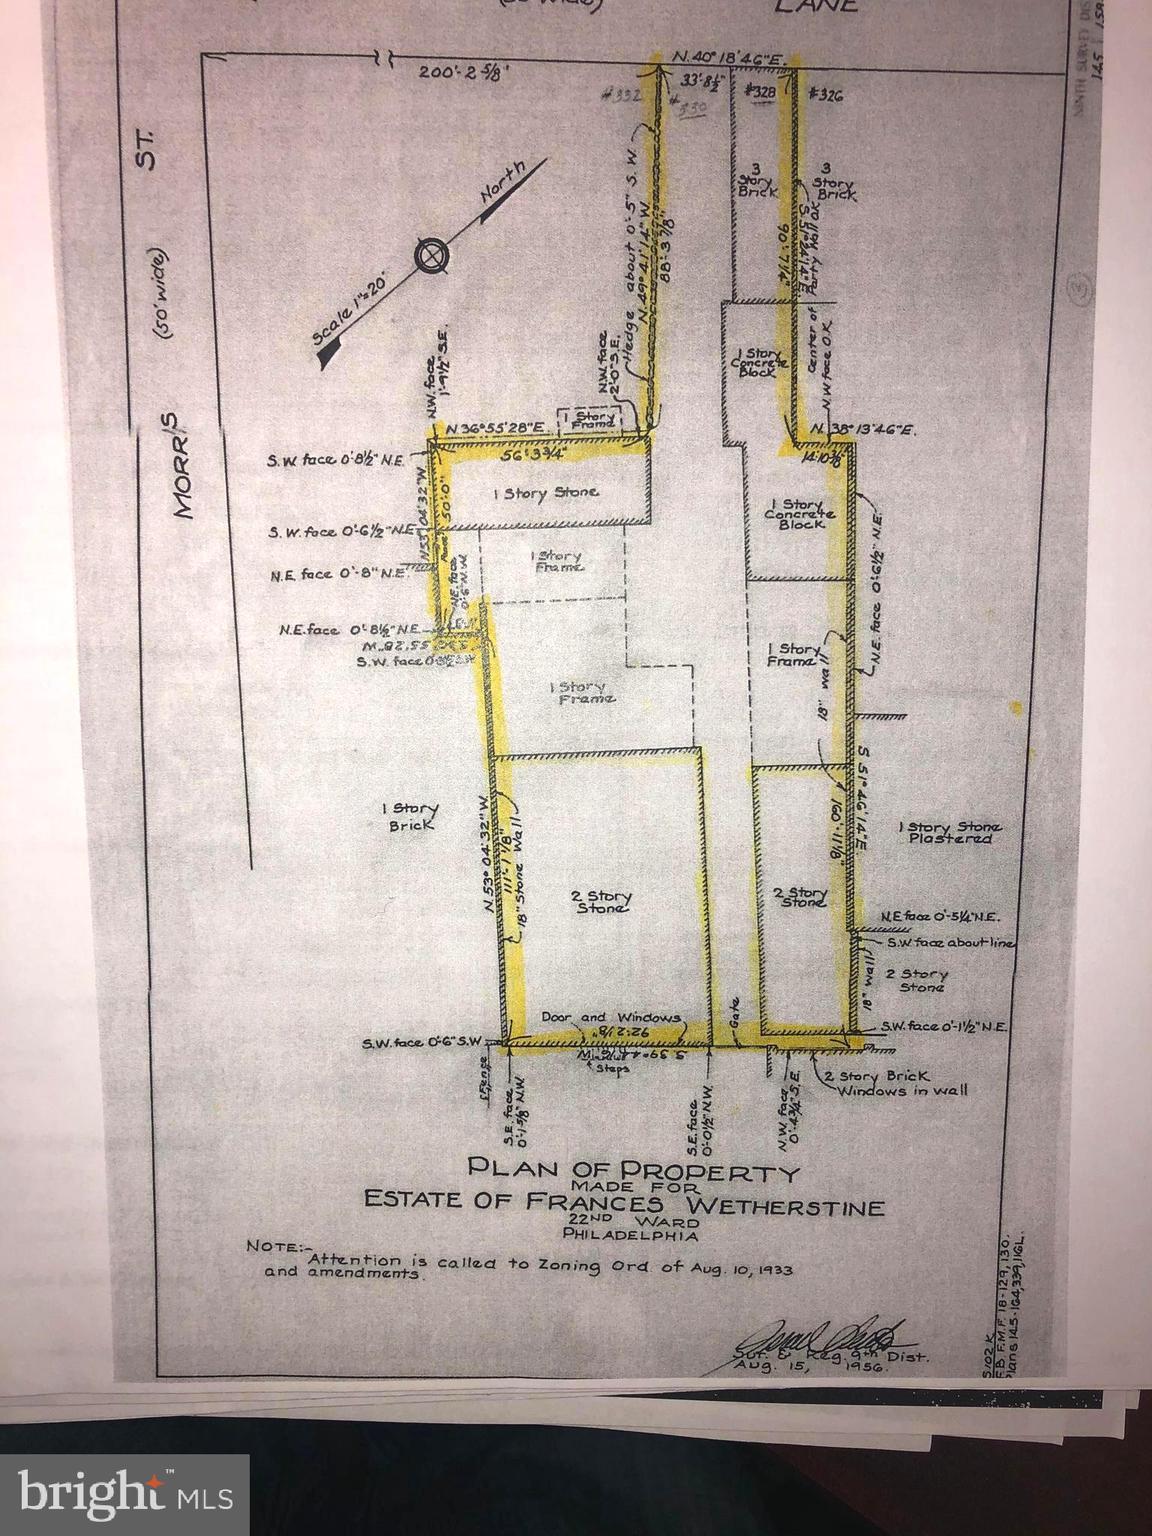 328 W QUEEN LANE, PHILADELPHIA, PA 19144